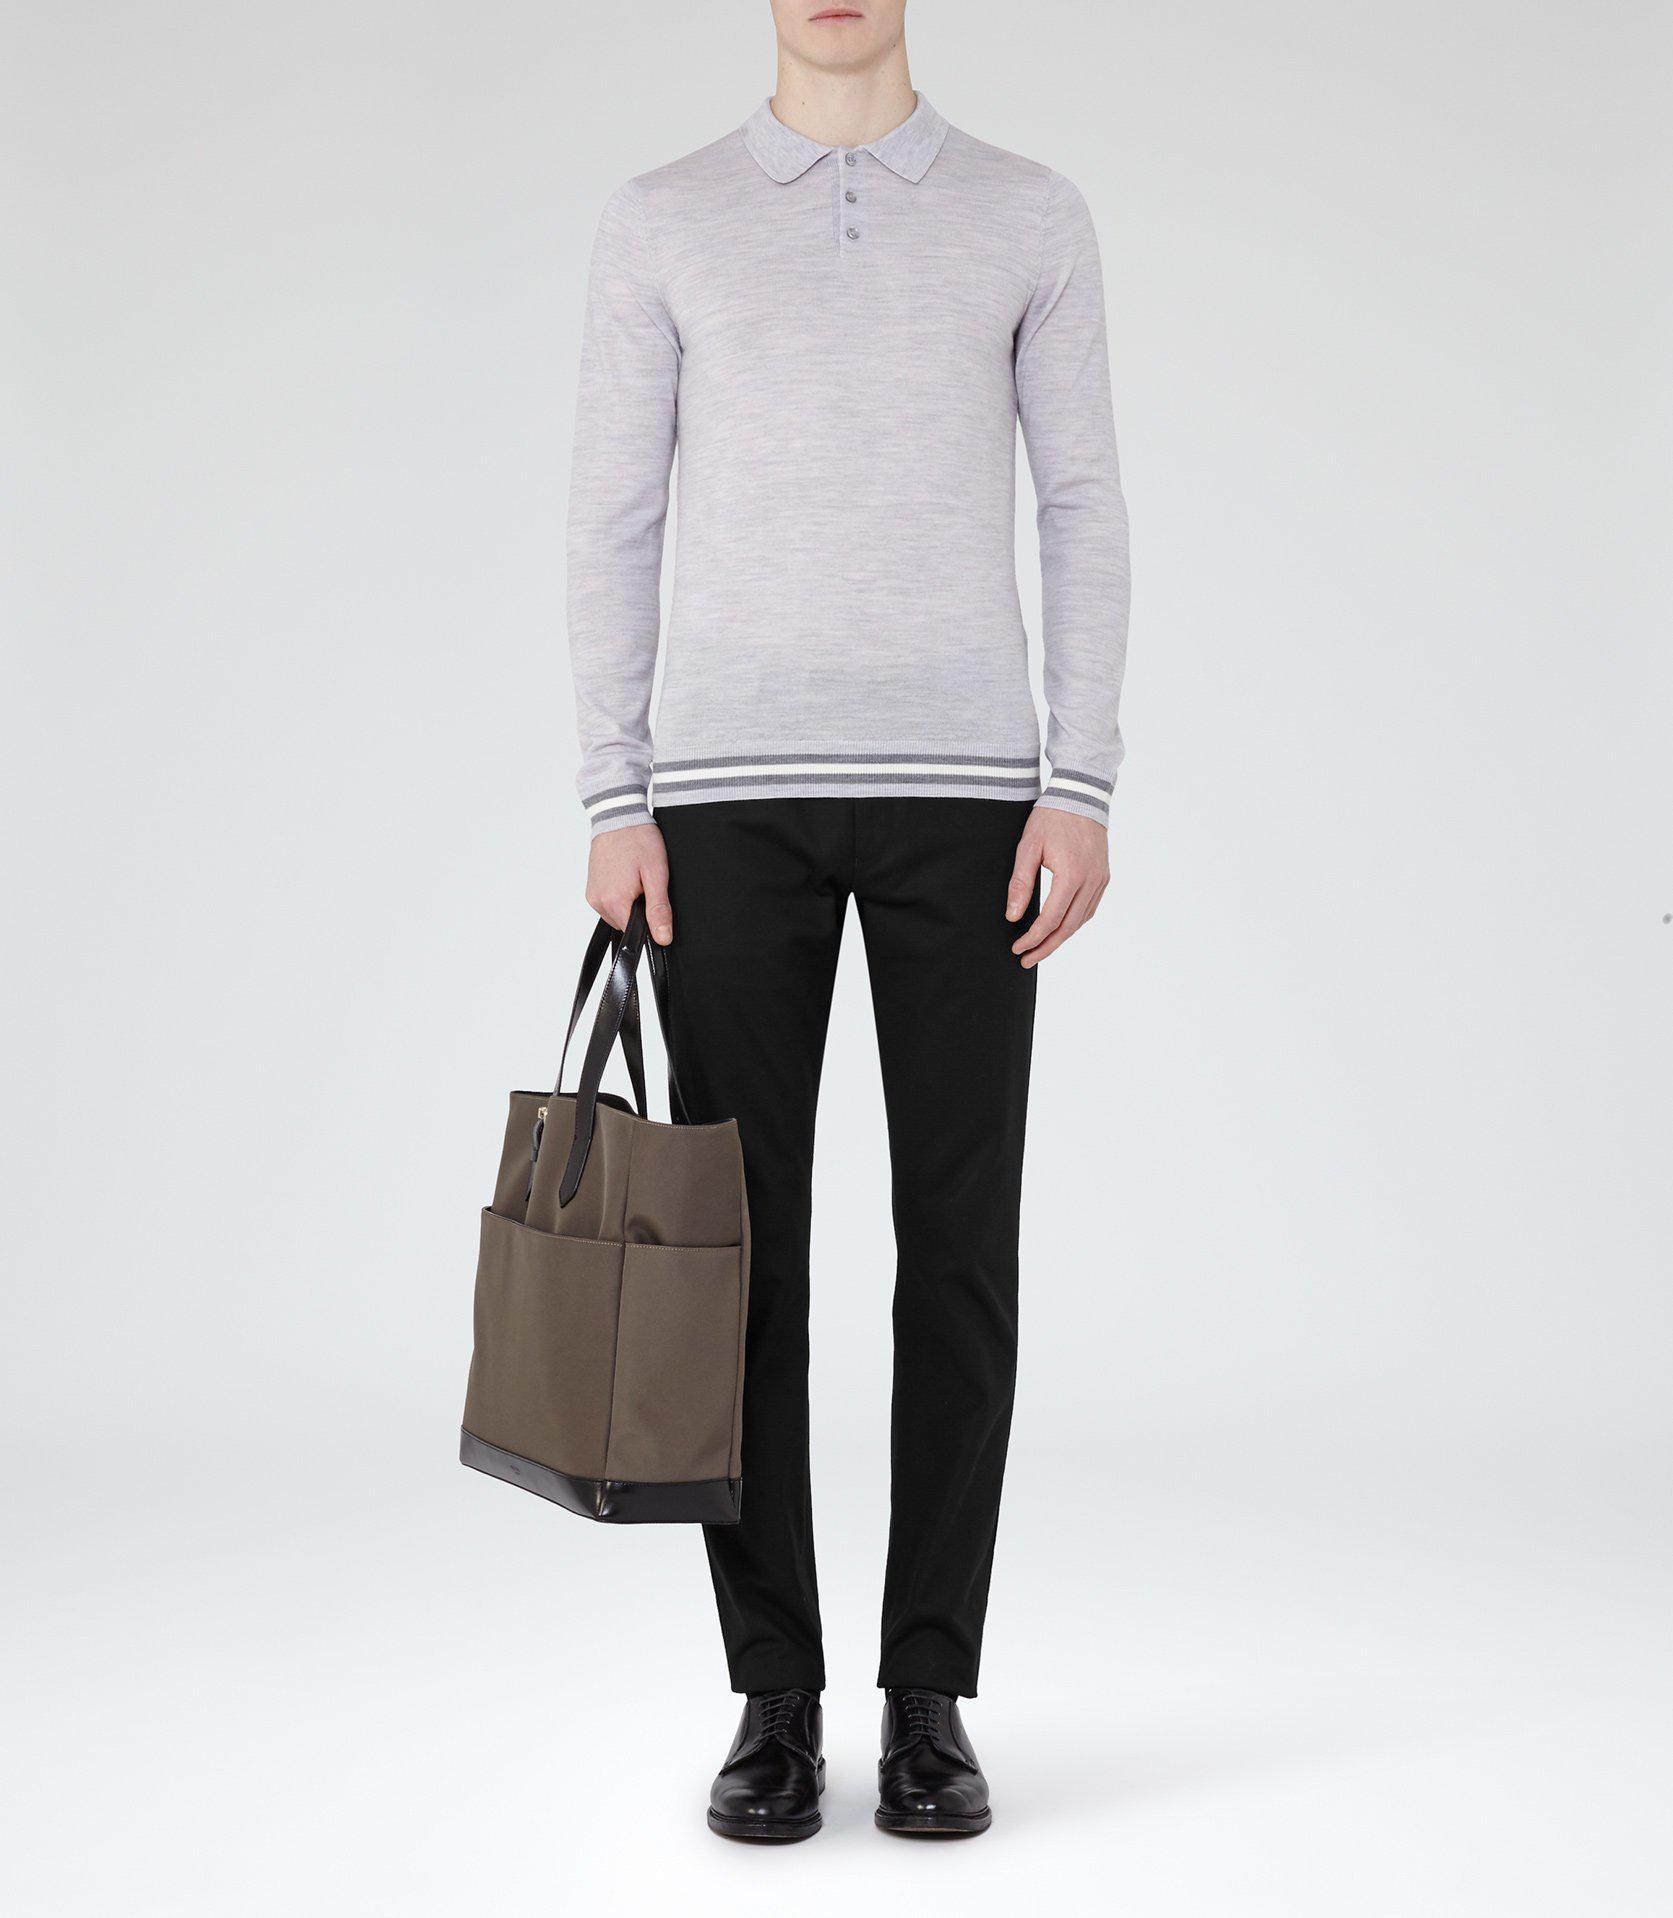 Reiss Wool Antonio in Soft Grey (Grey) for Men